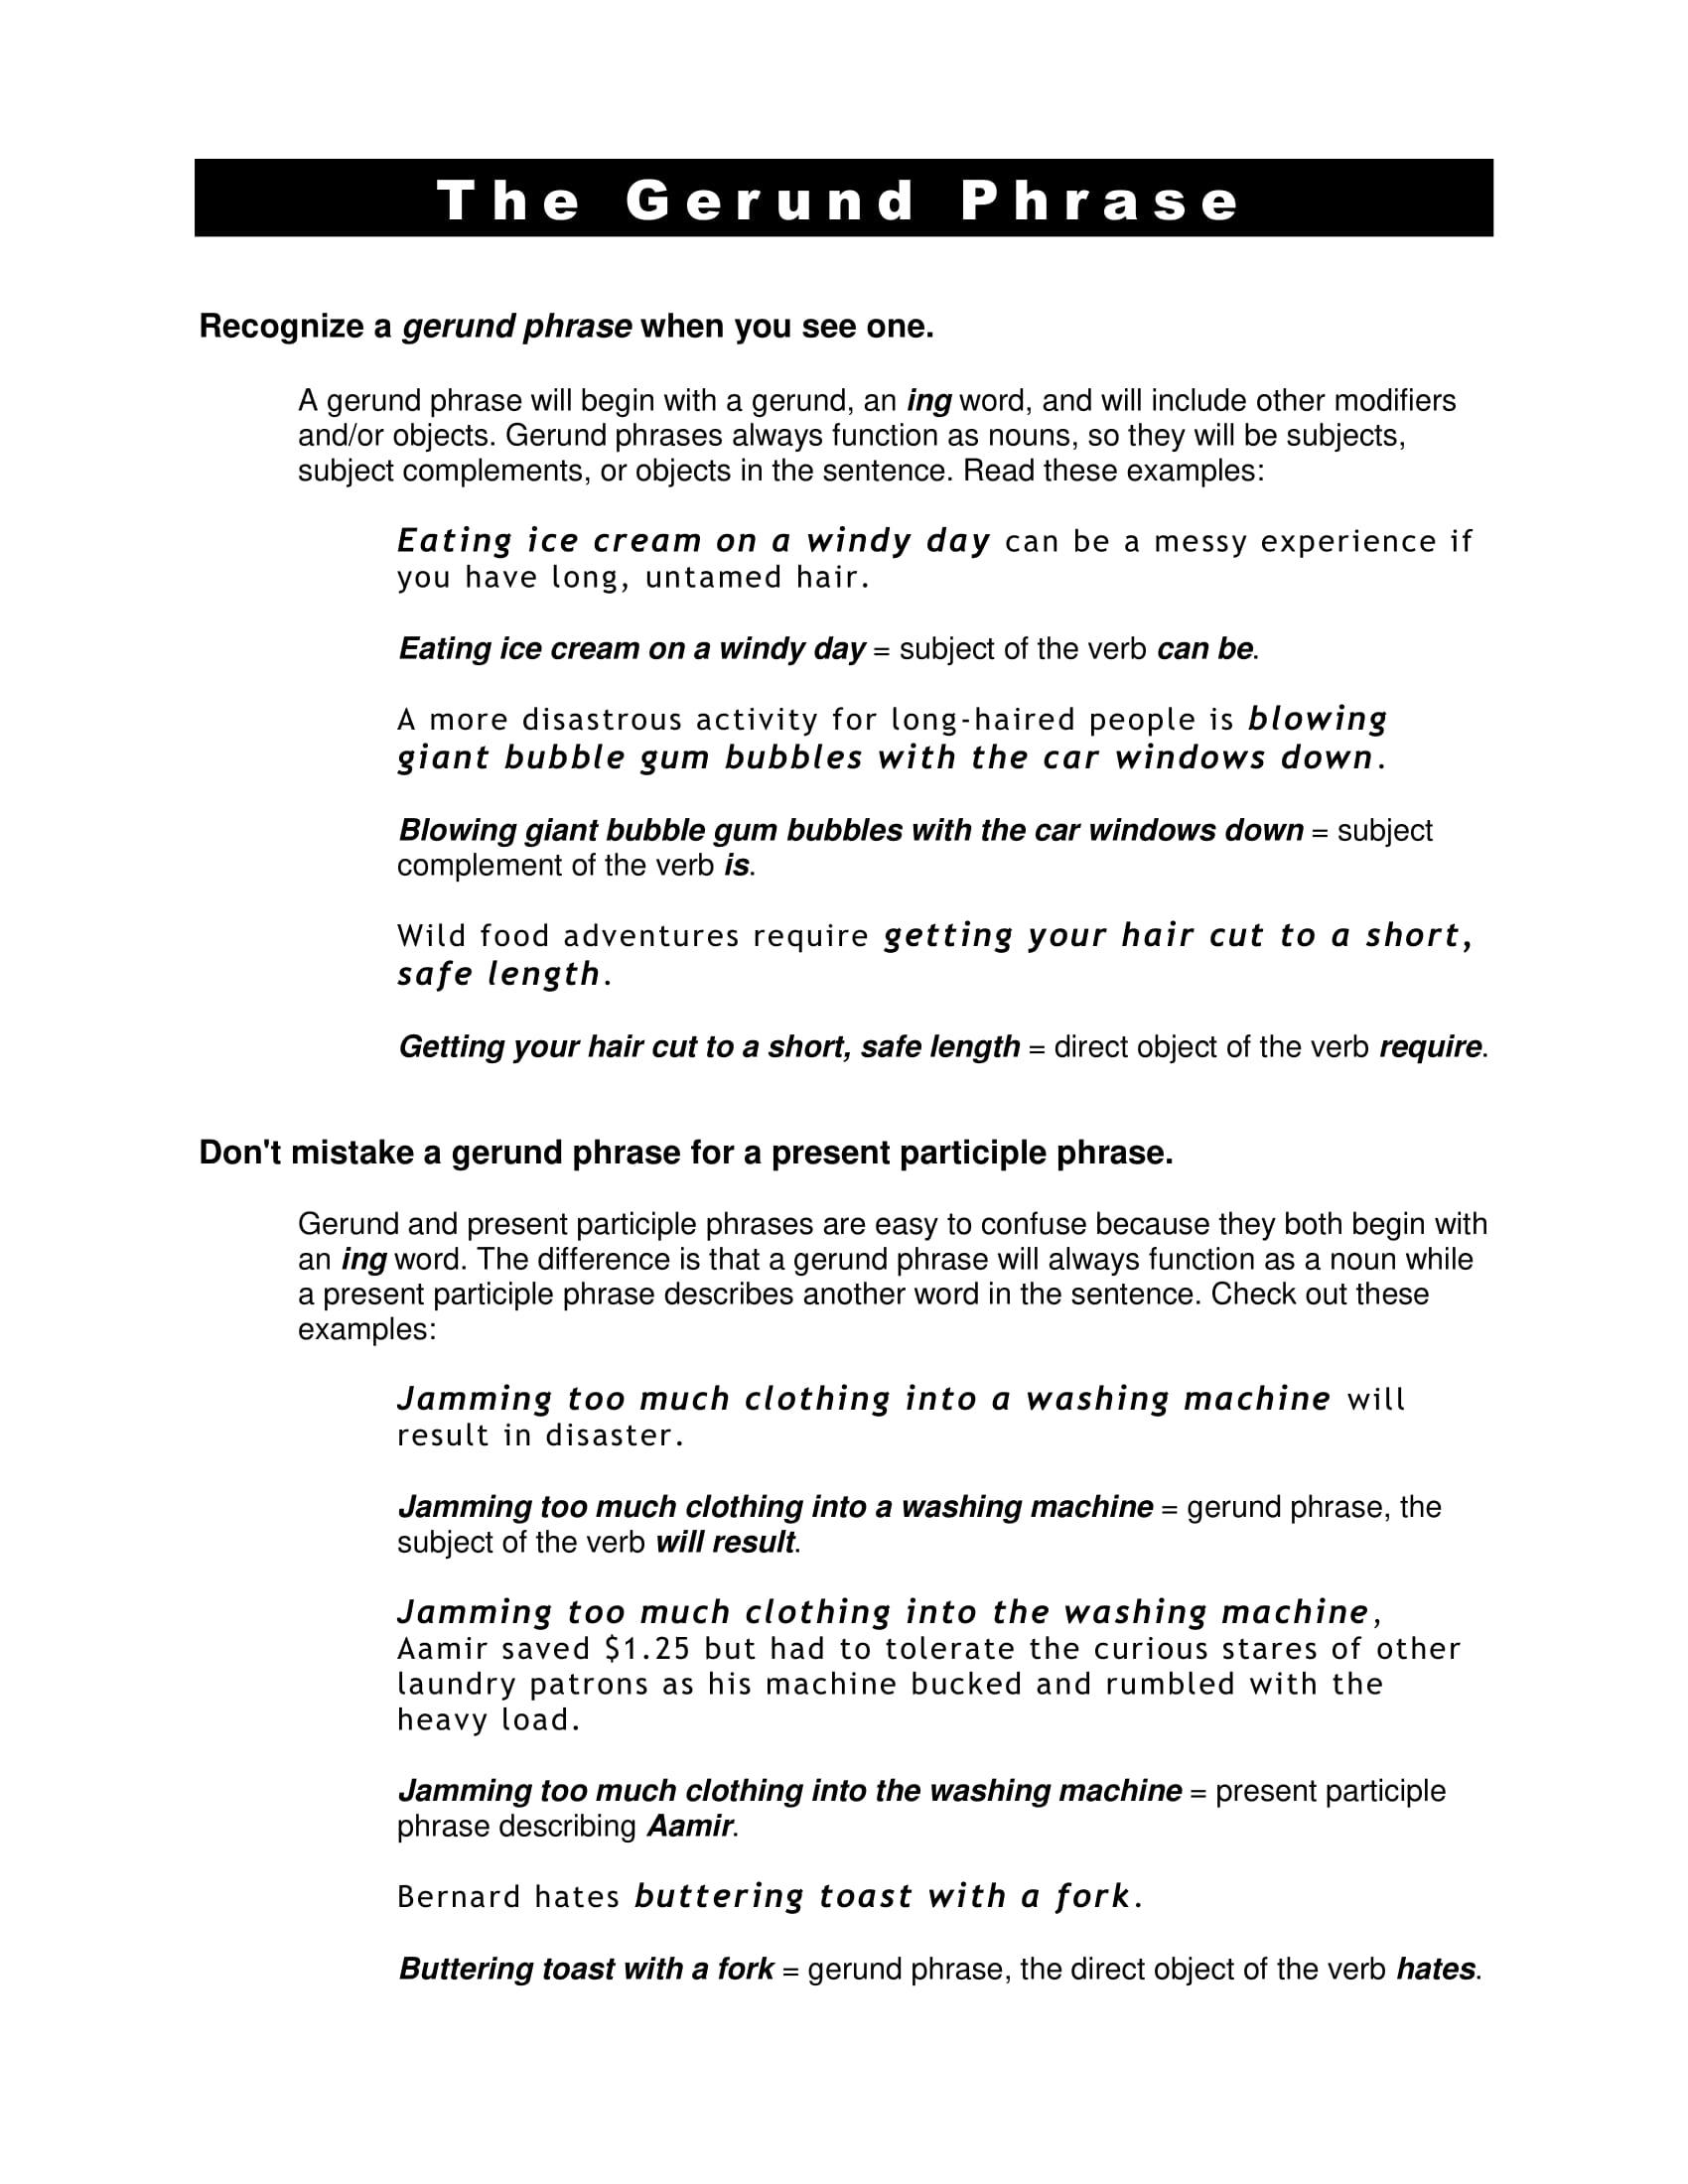 9 Gerund Phrase Examples